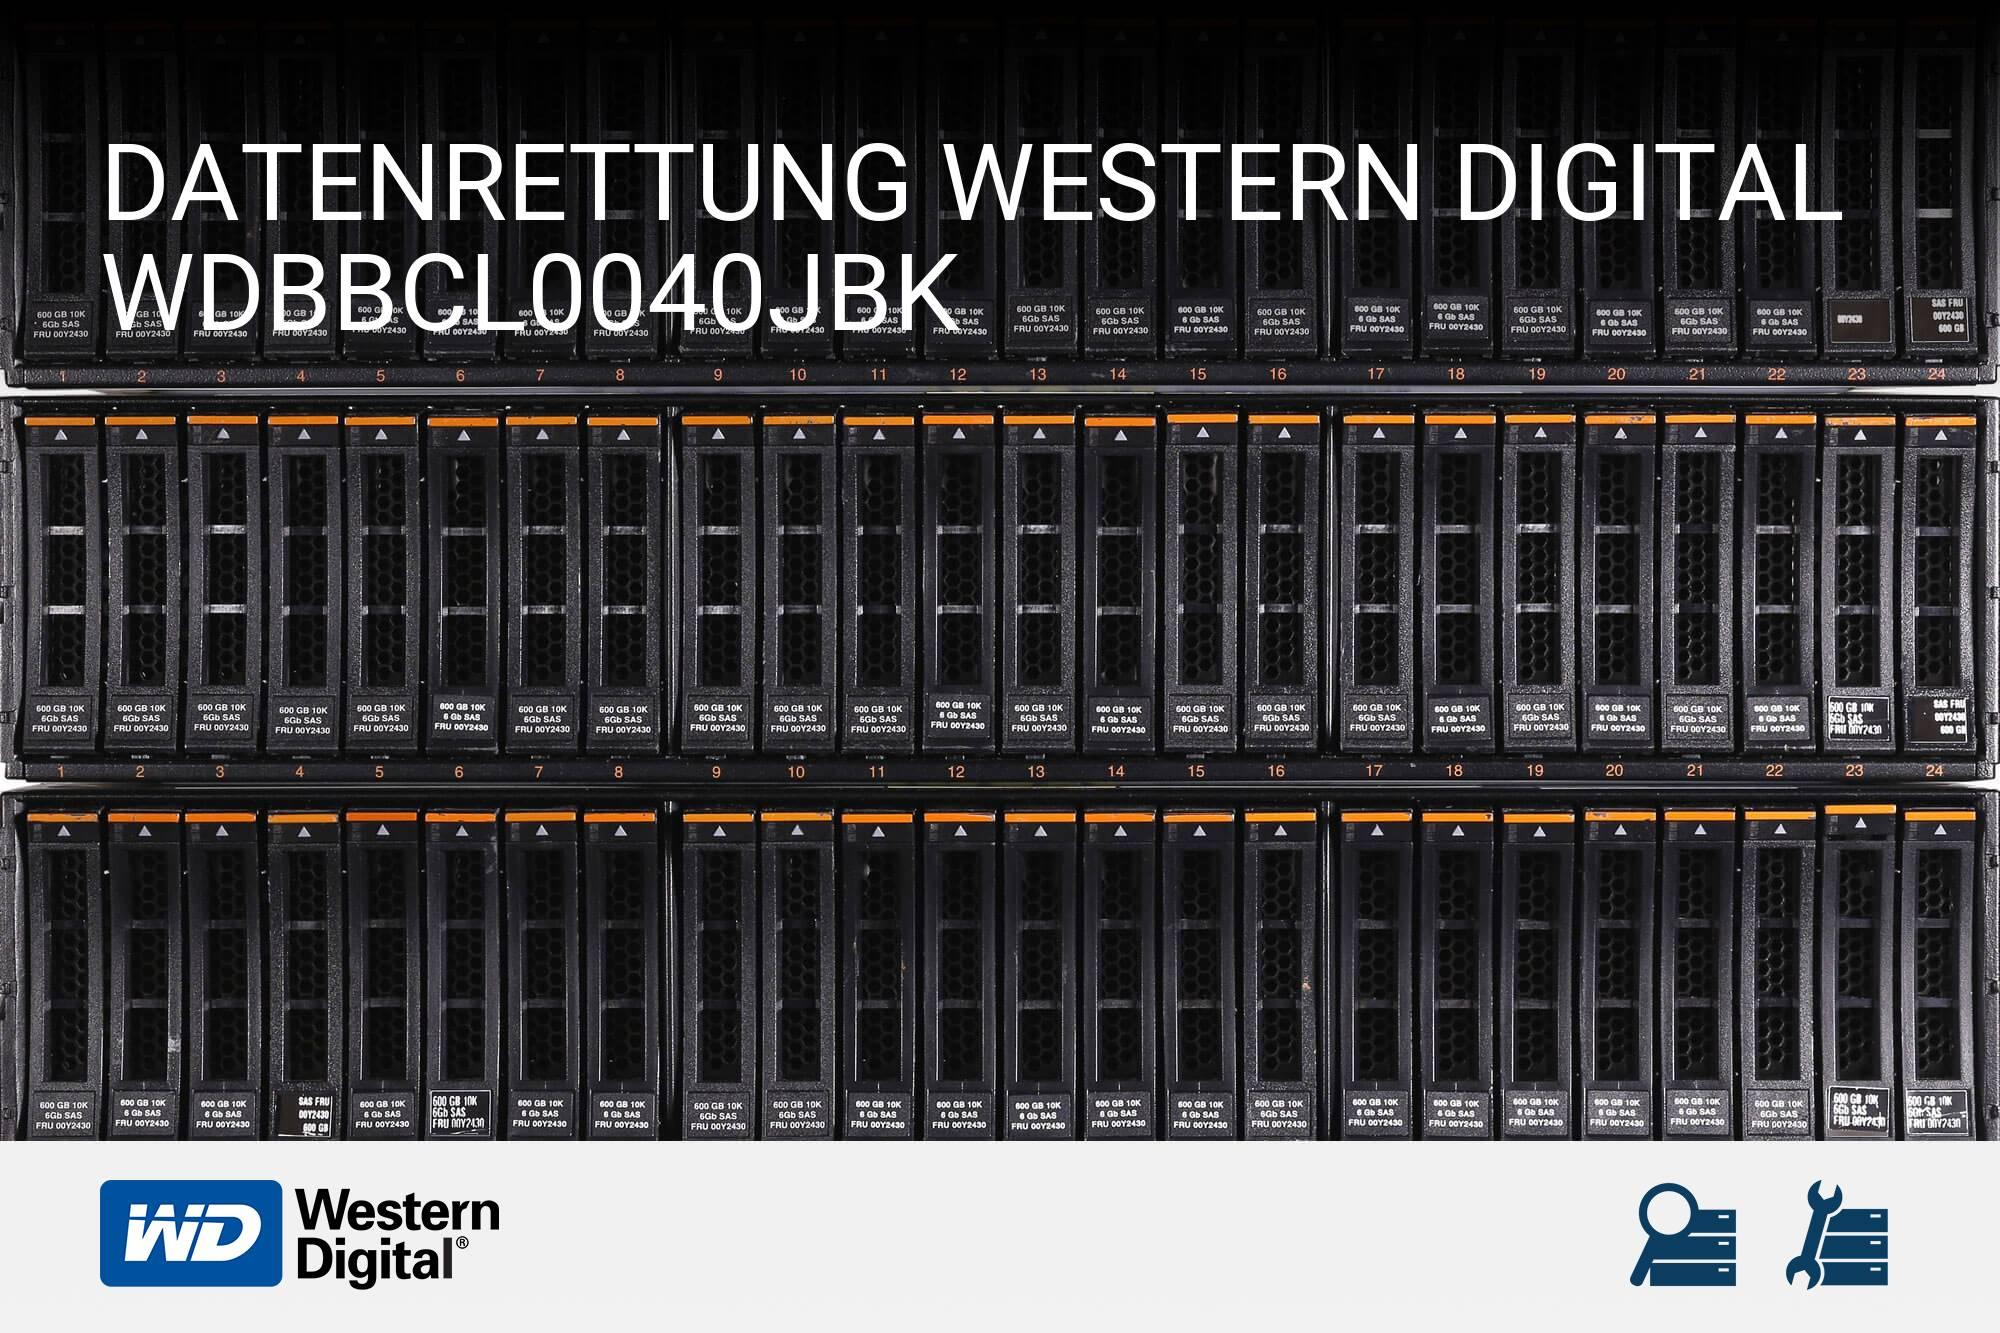 Western Digital WDBBCL0040JBK